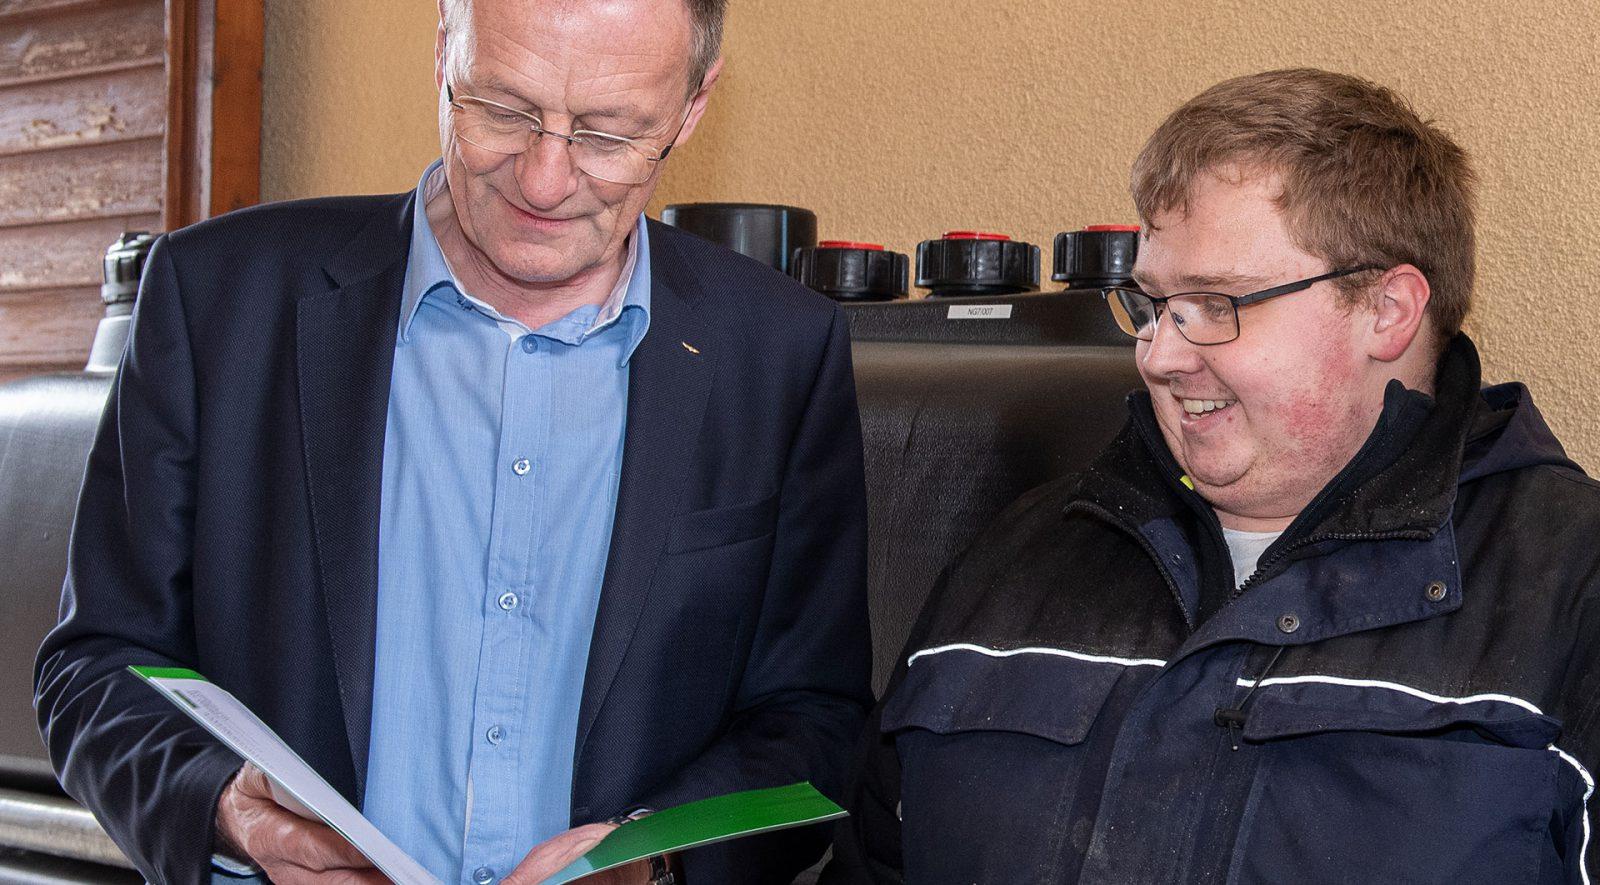 Ing. Roman Aschl und Lukas Hundstorfer